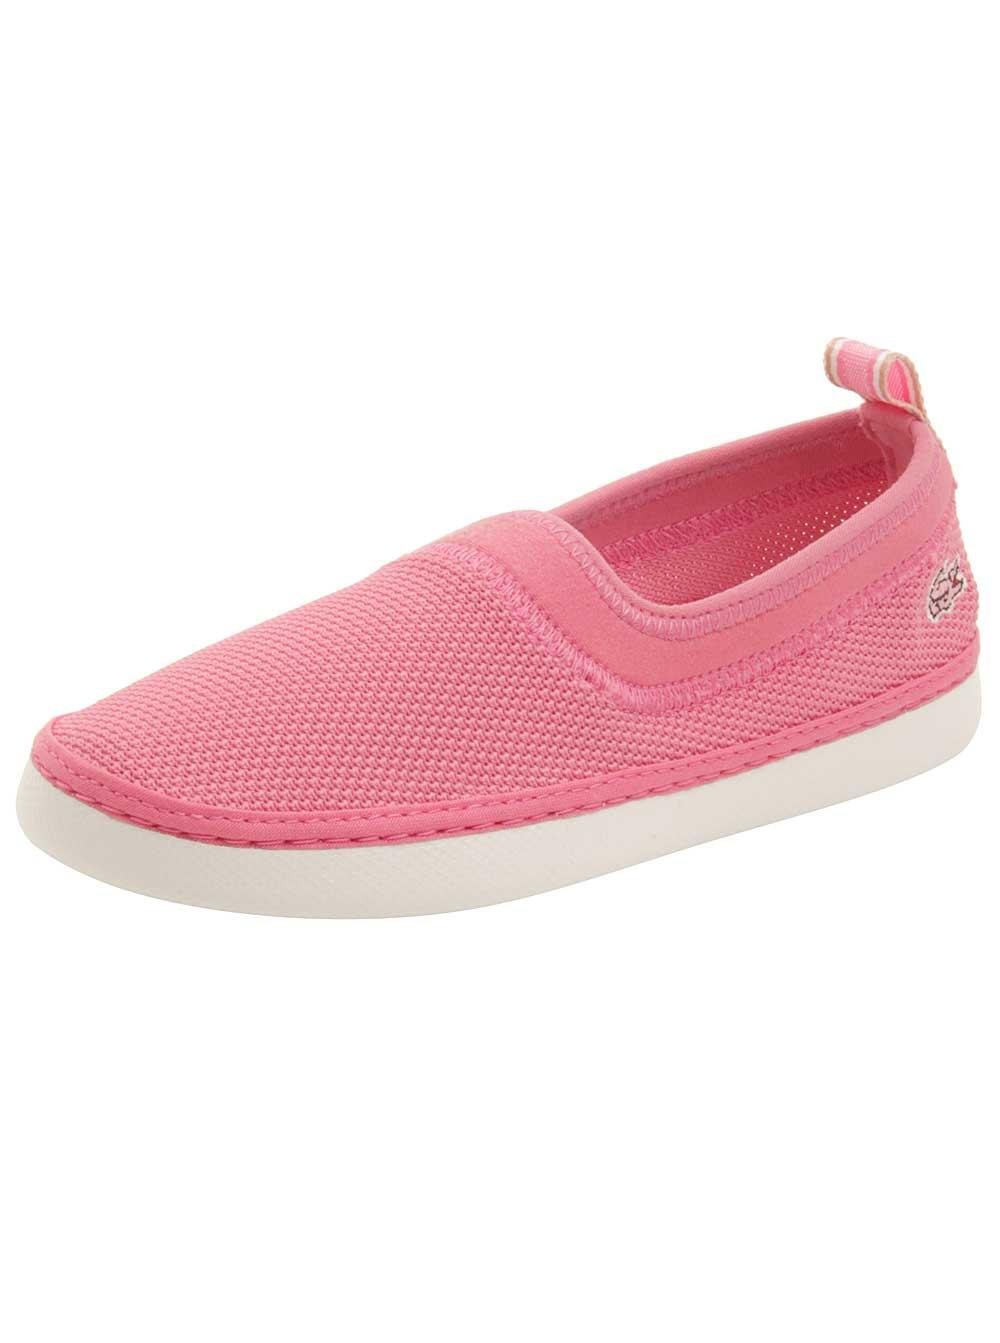 Lacoste Toddler L.ydro 118 1 Sneaker